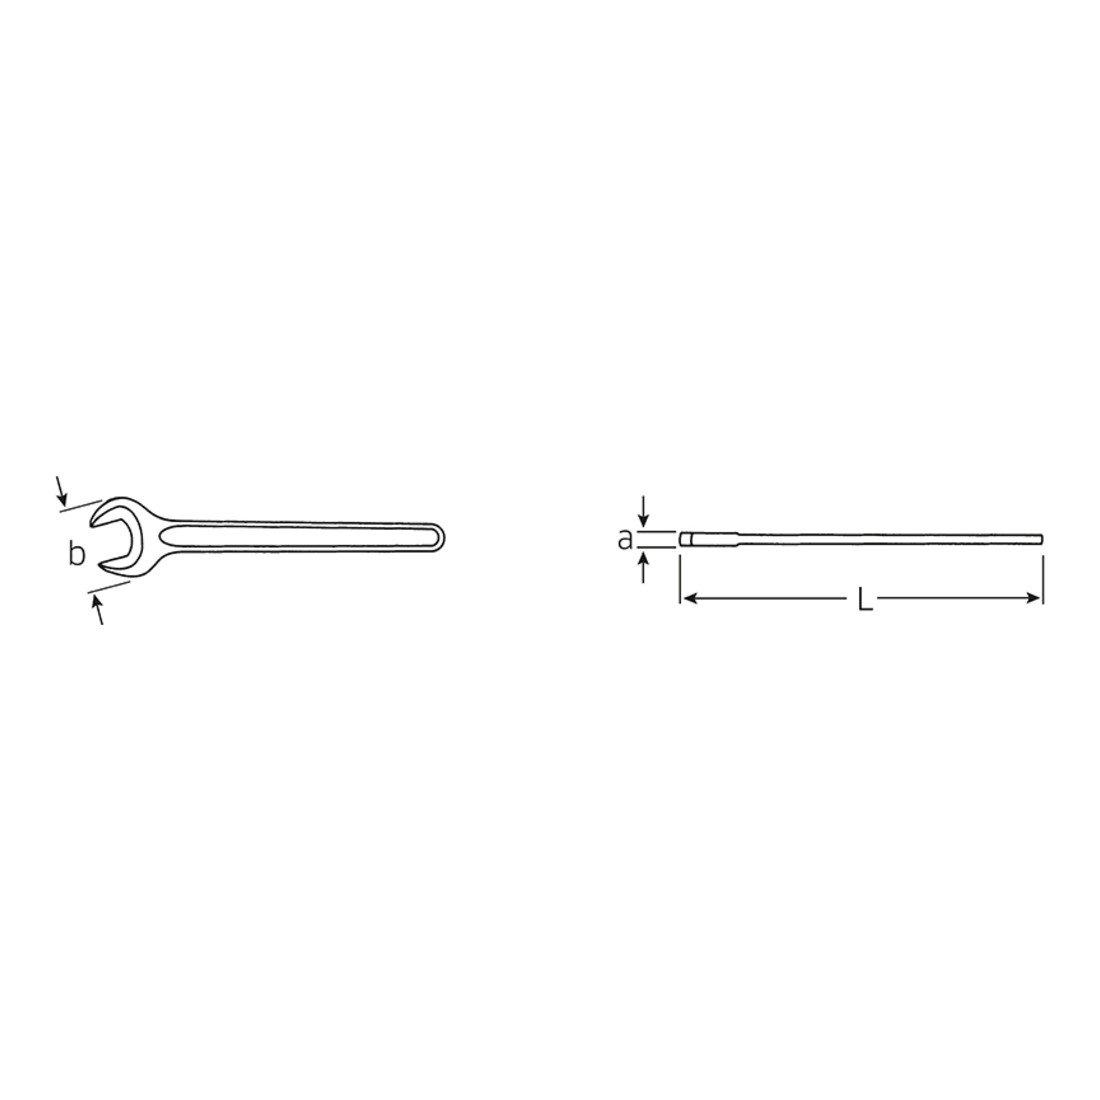 Stahlwille Doppelringschluessel 4004/55/flach Mund feste